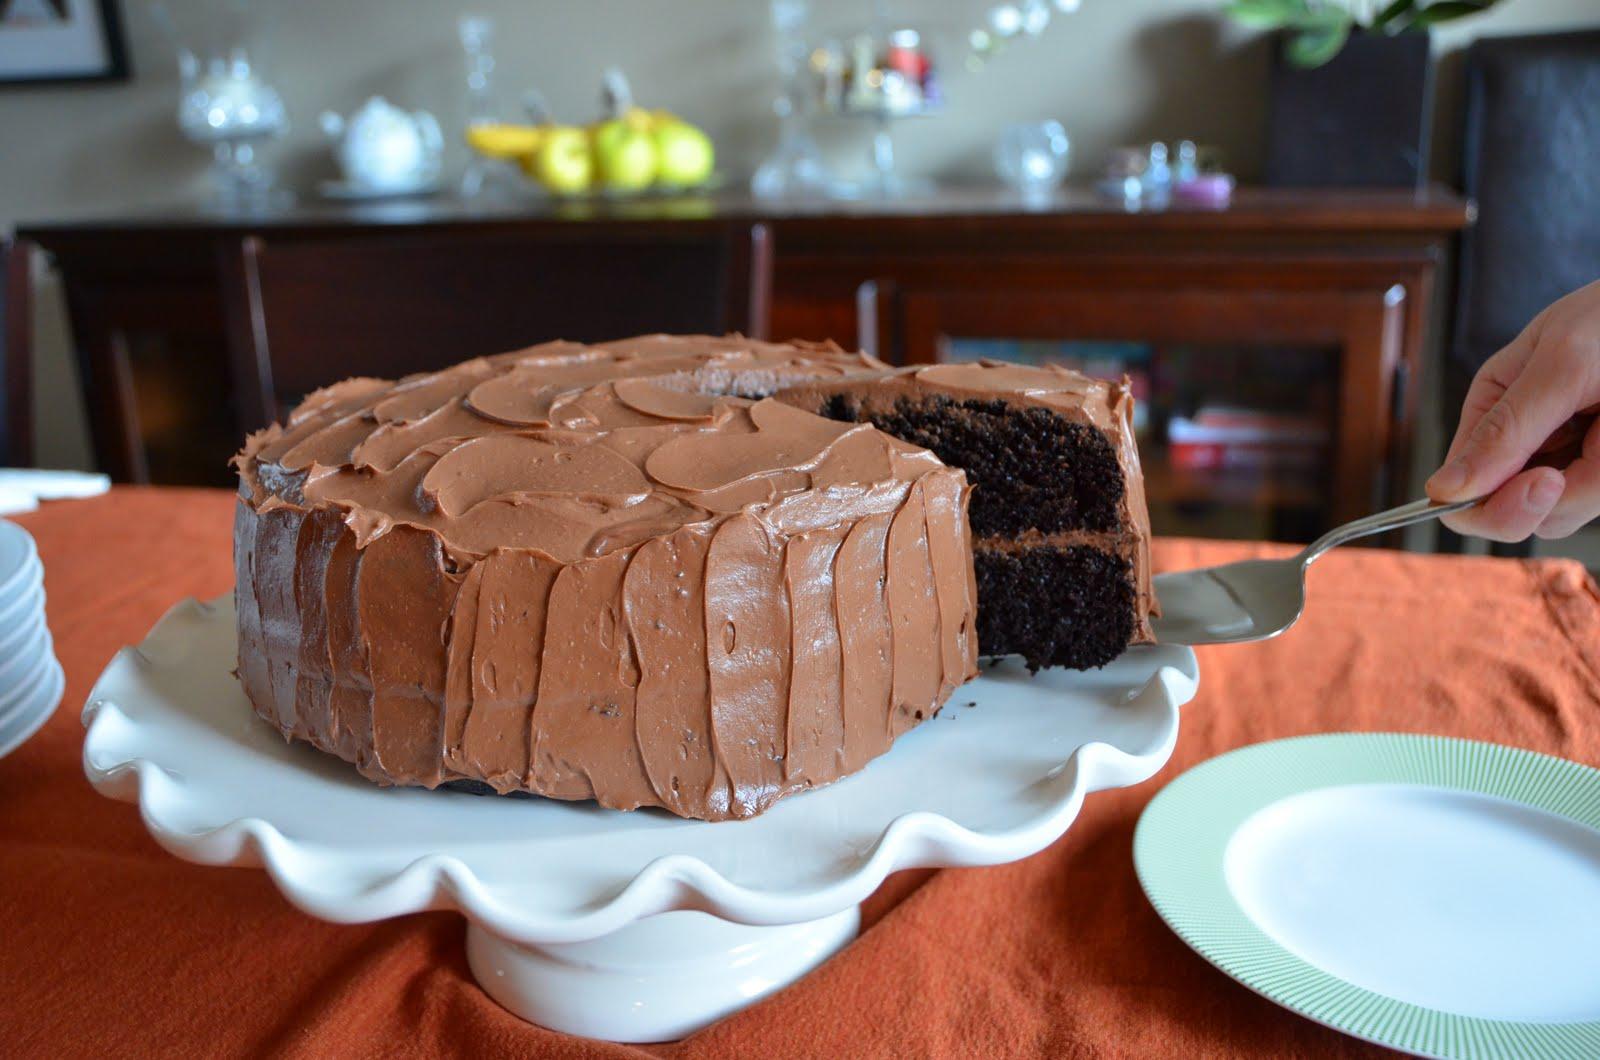 Ultra Chocolate Cake